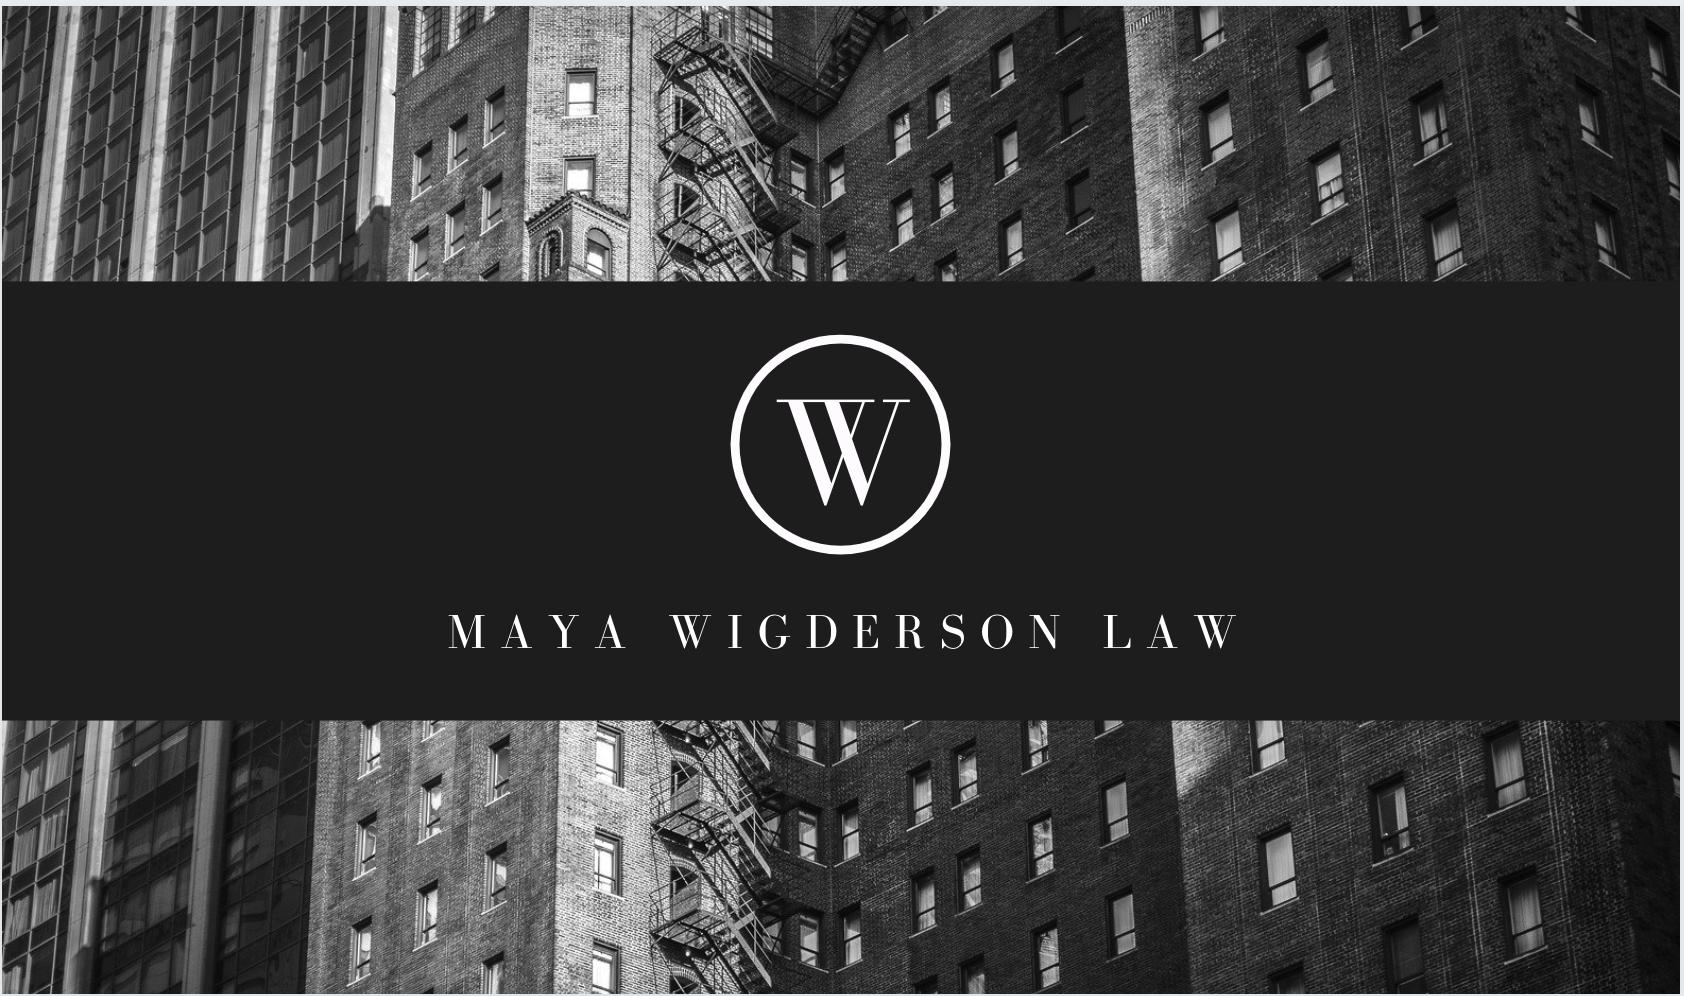 Wigderson Law